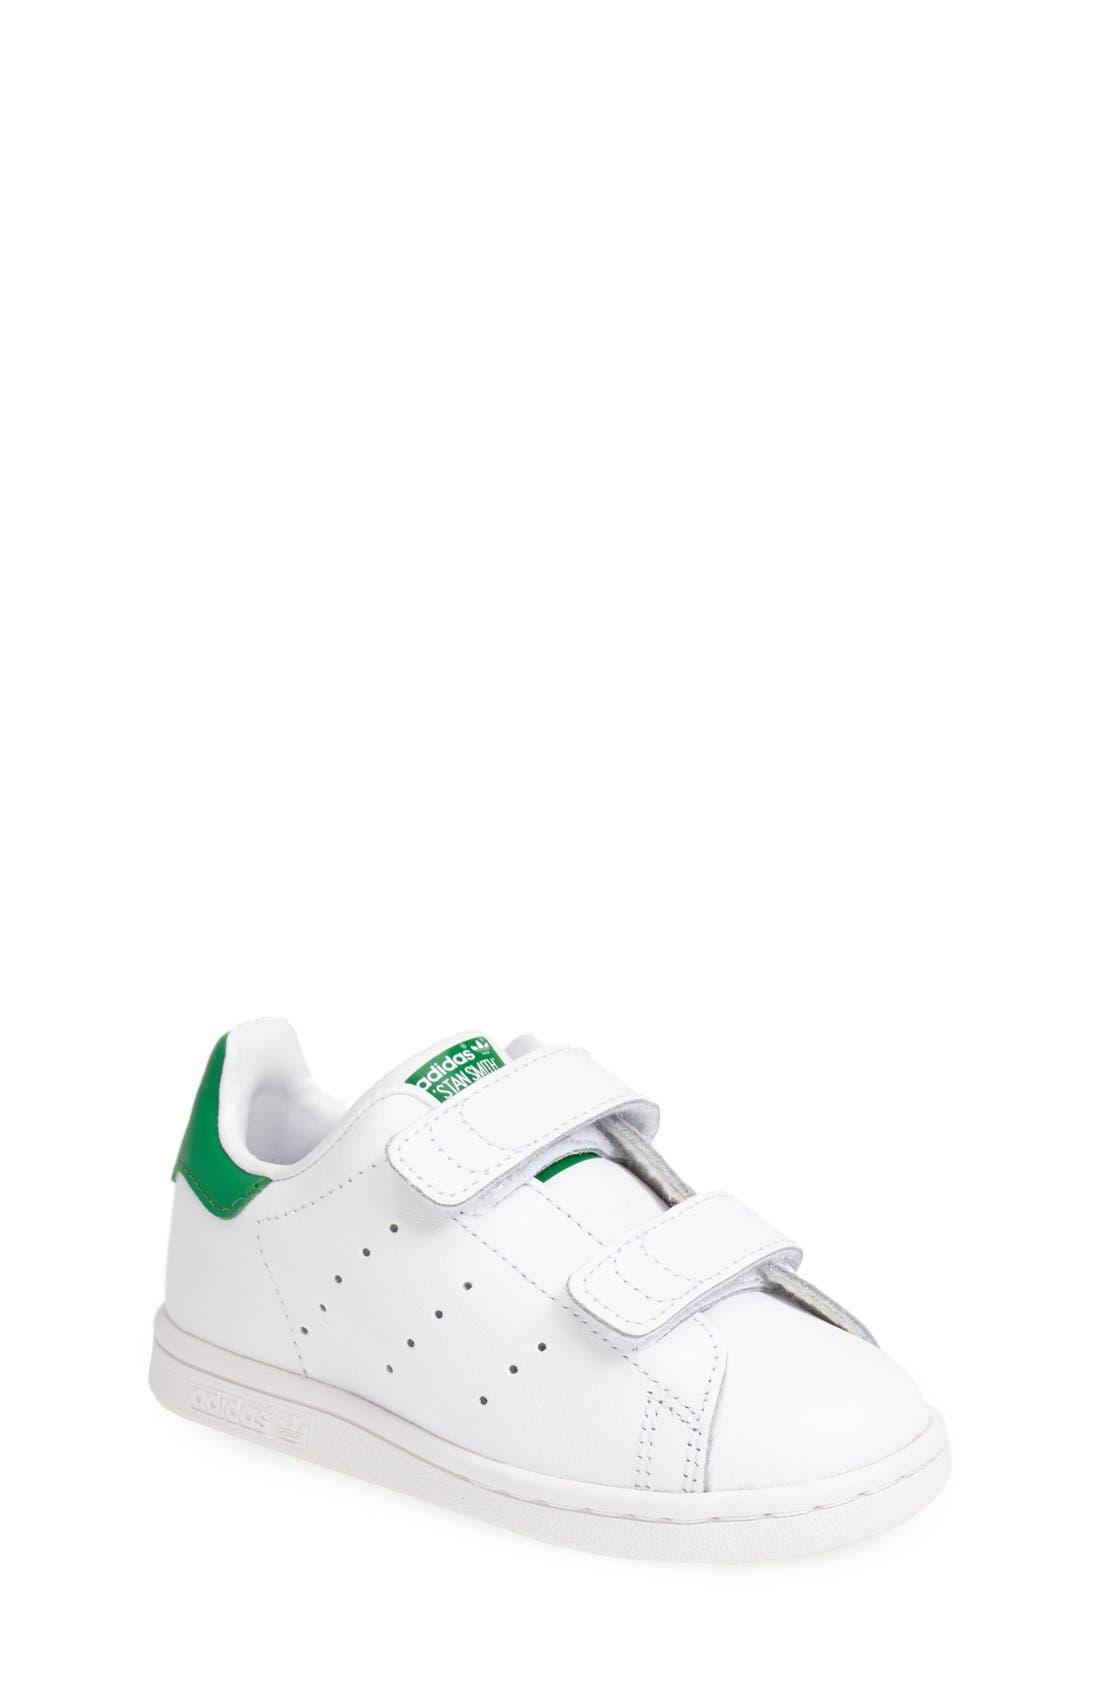 Main Image - adidas \u0027Stan Smith\u0027 Leather Sneaker (Baby, Walker \u0026 Toddler